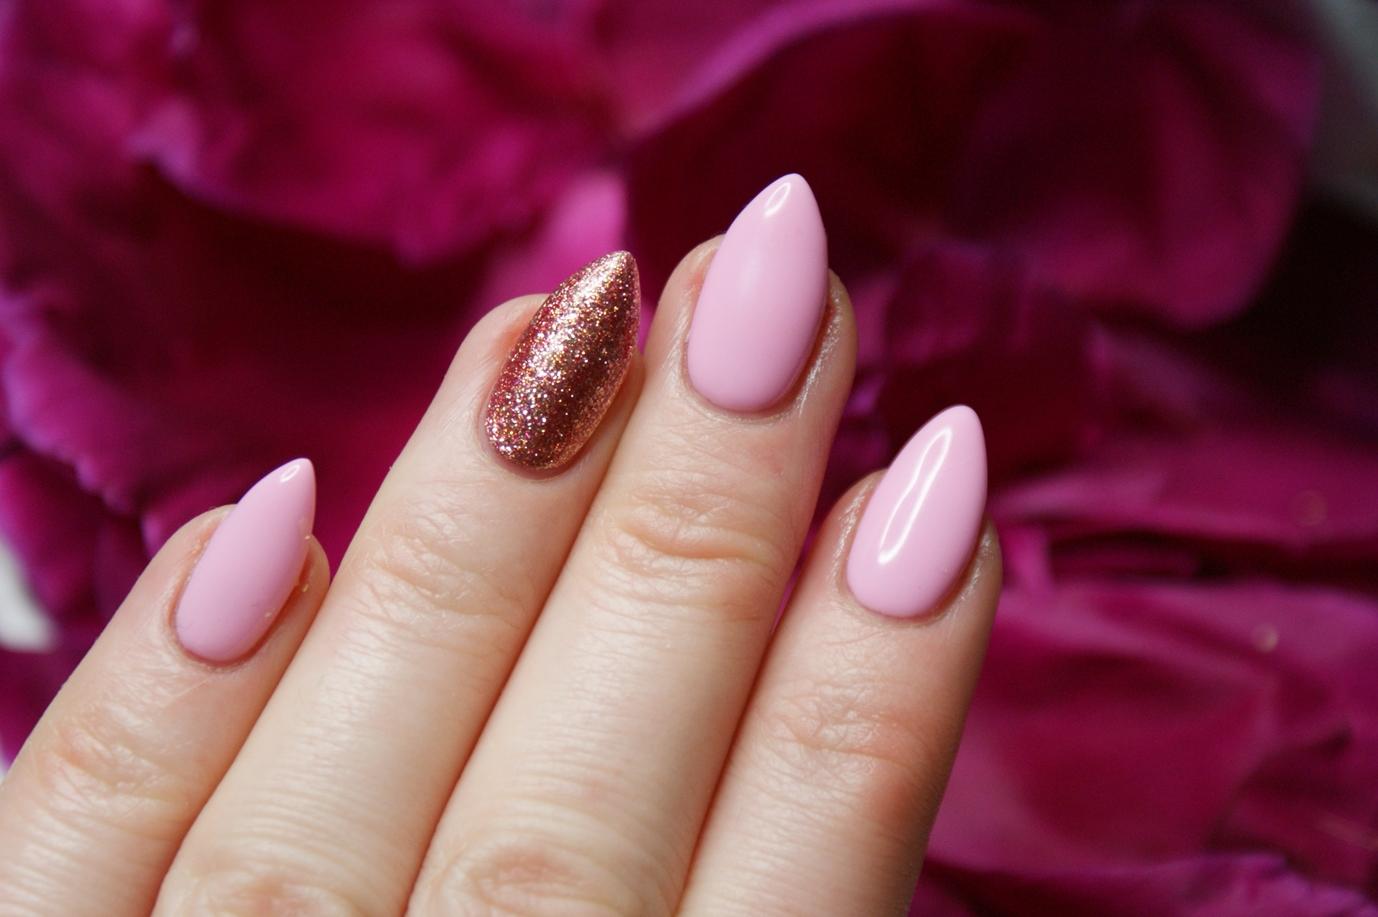 Biankowo Manicure Hybrydowy Semilac 6 003 094